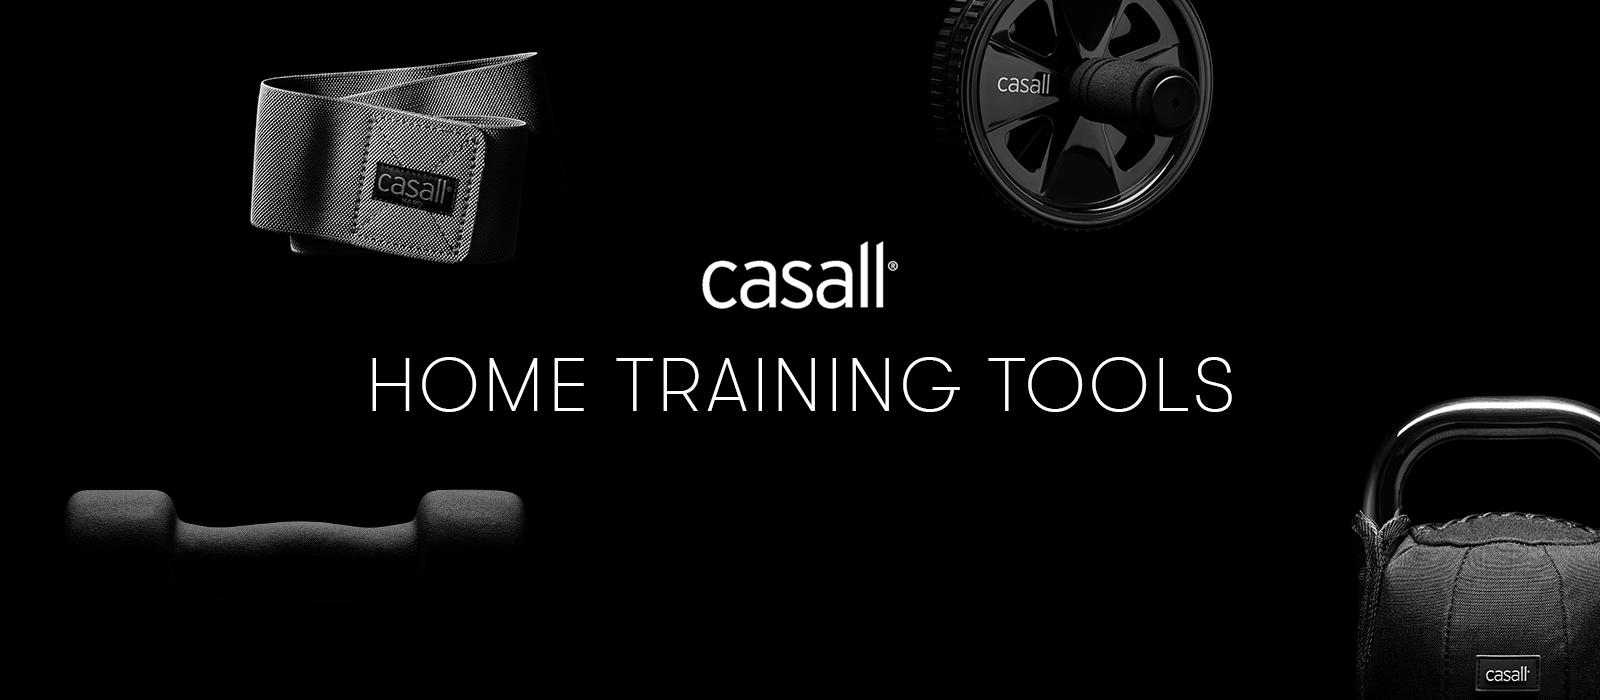 CASALL HOME TRAINING